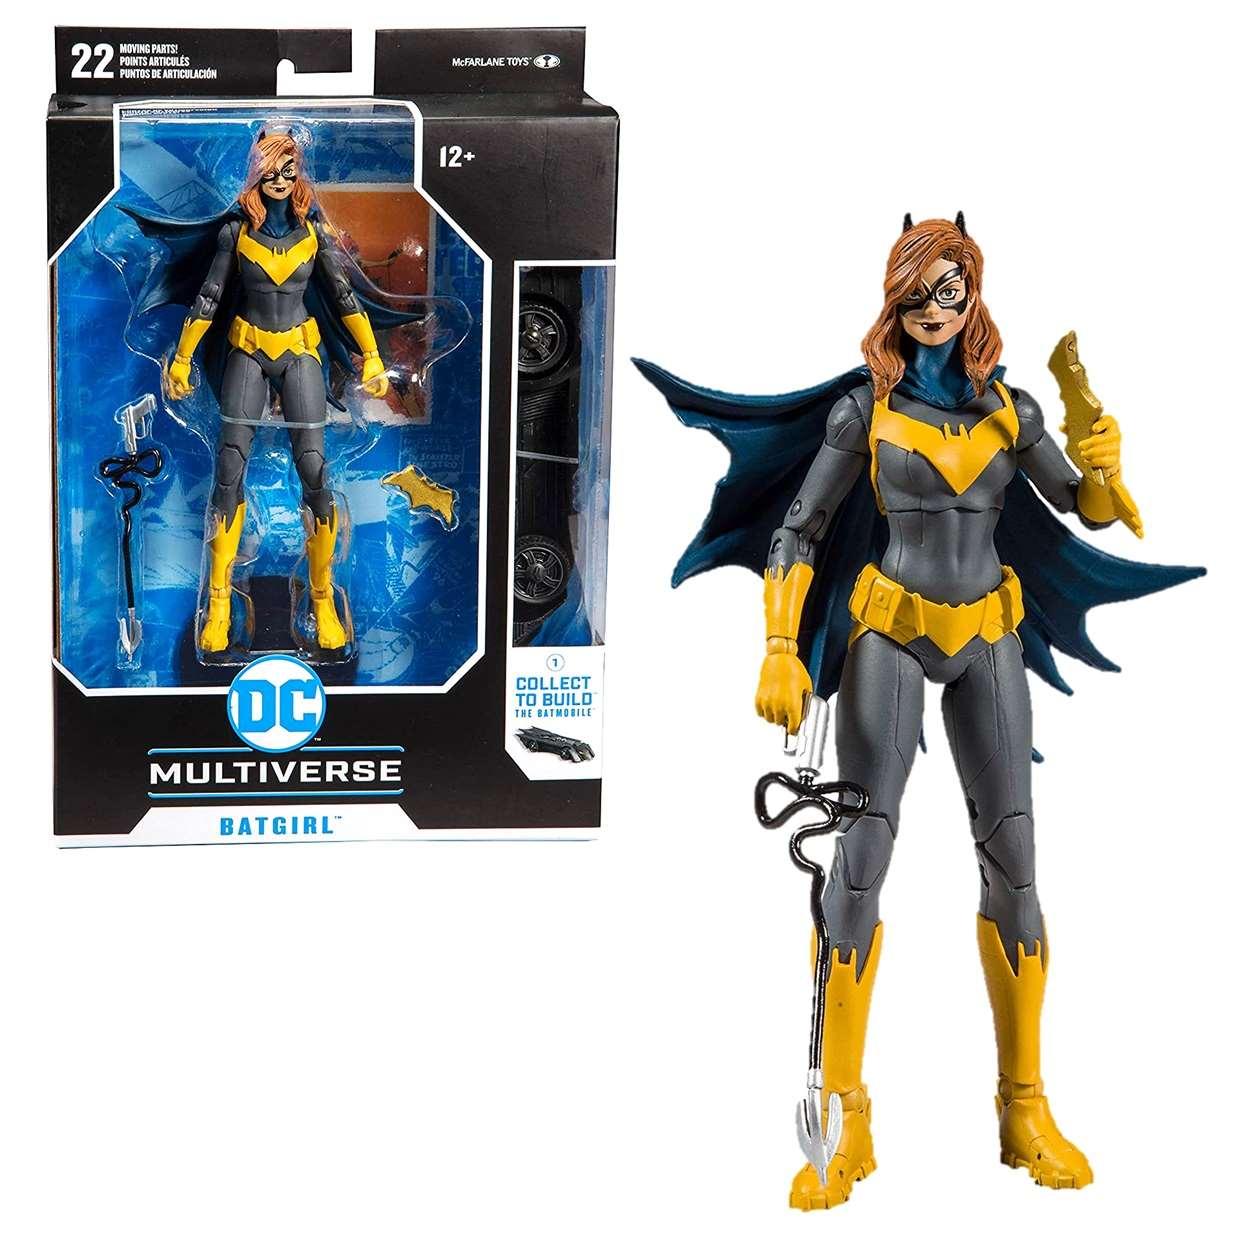 Batgirl Art Of The Crime Figura Dc Multiverse Mcfarlane Toys